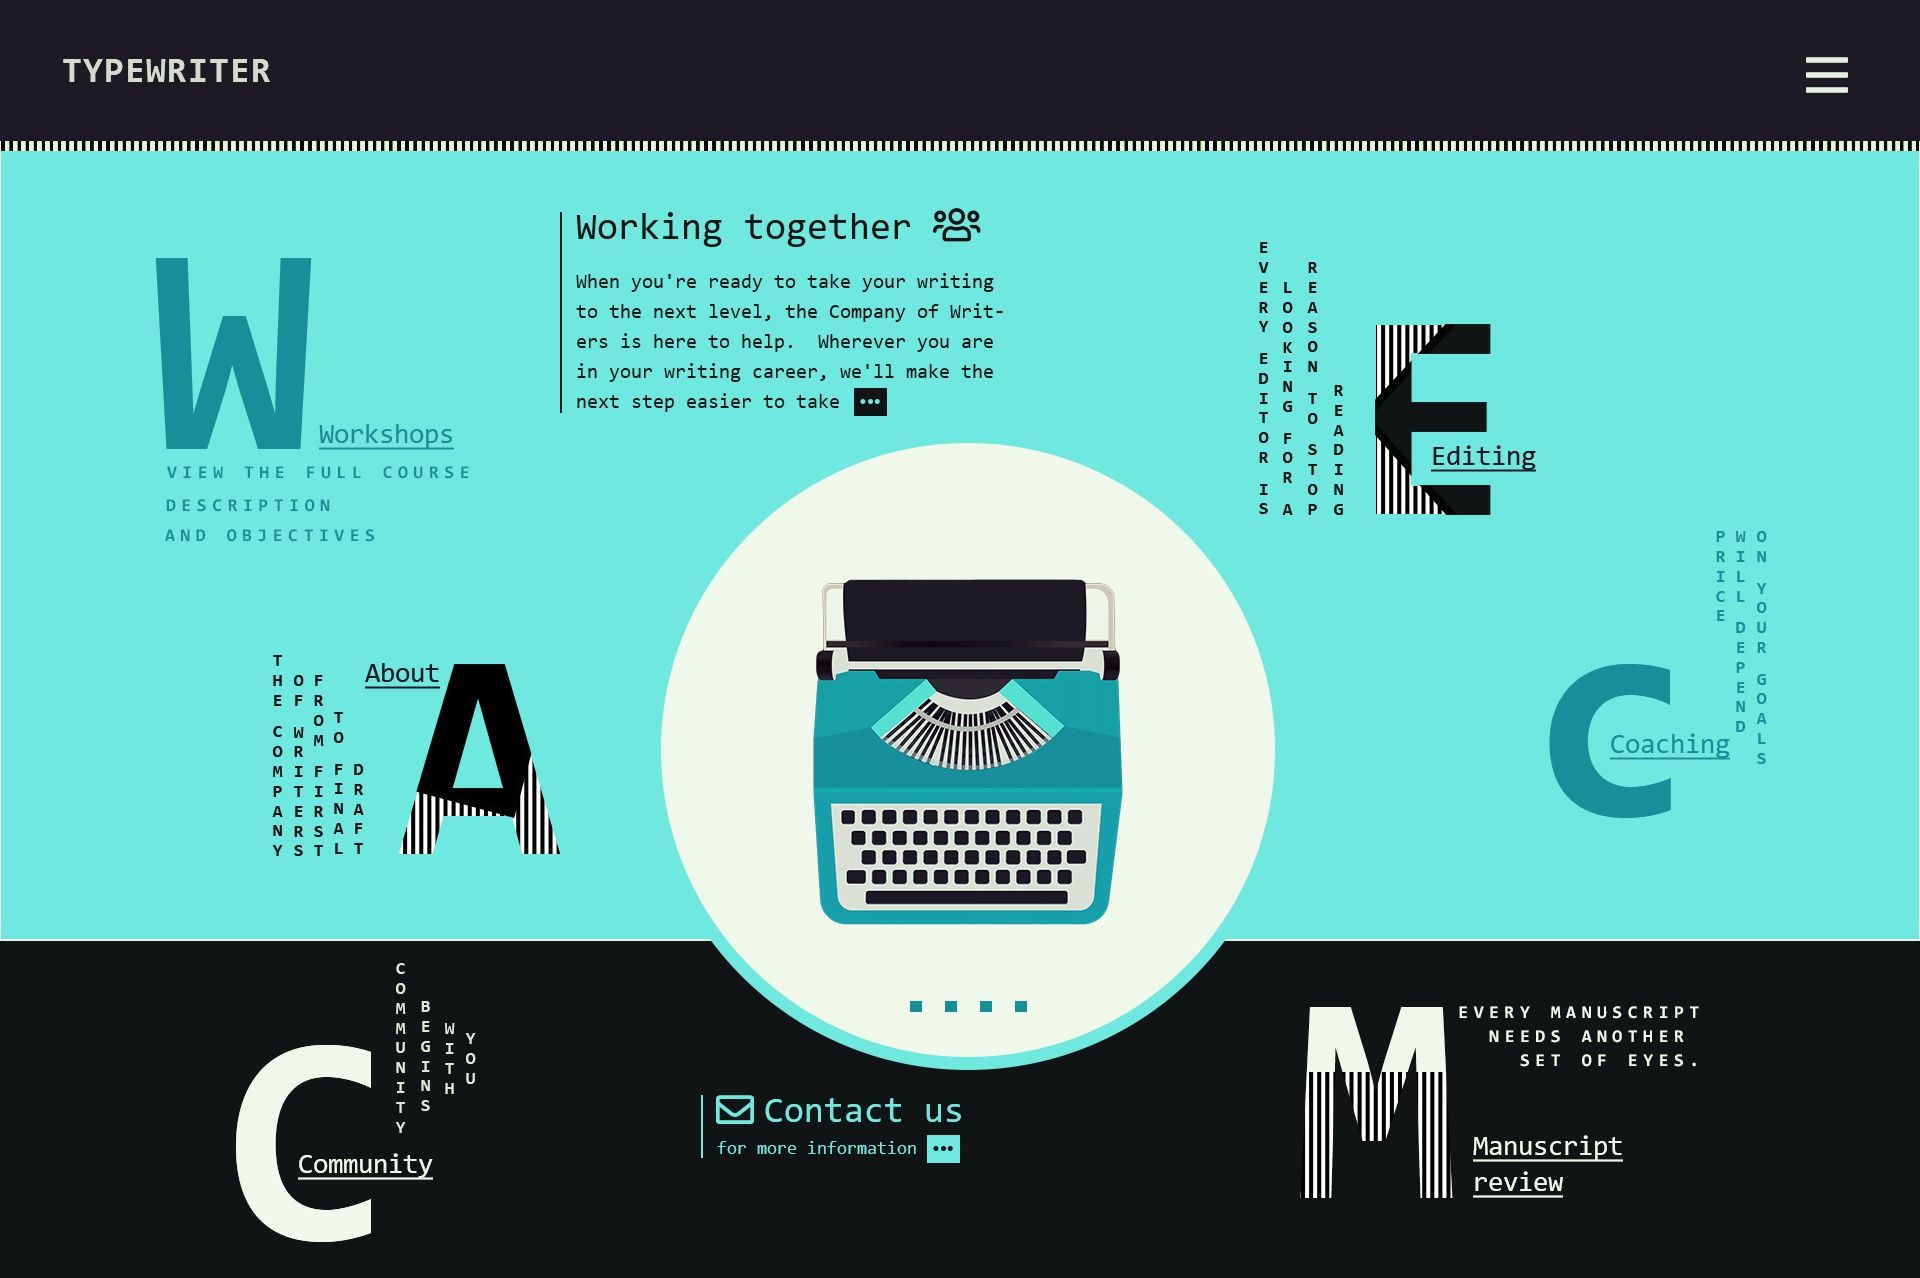 Typewriter company webdesign concepts 017 19